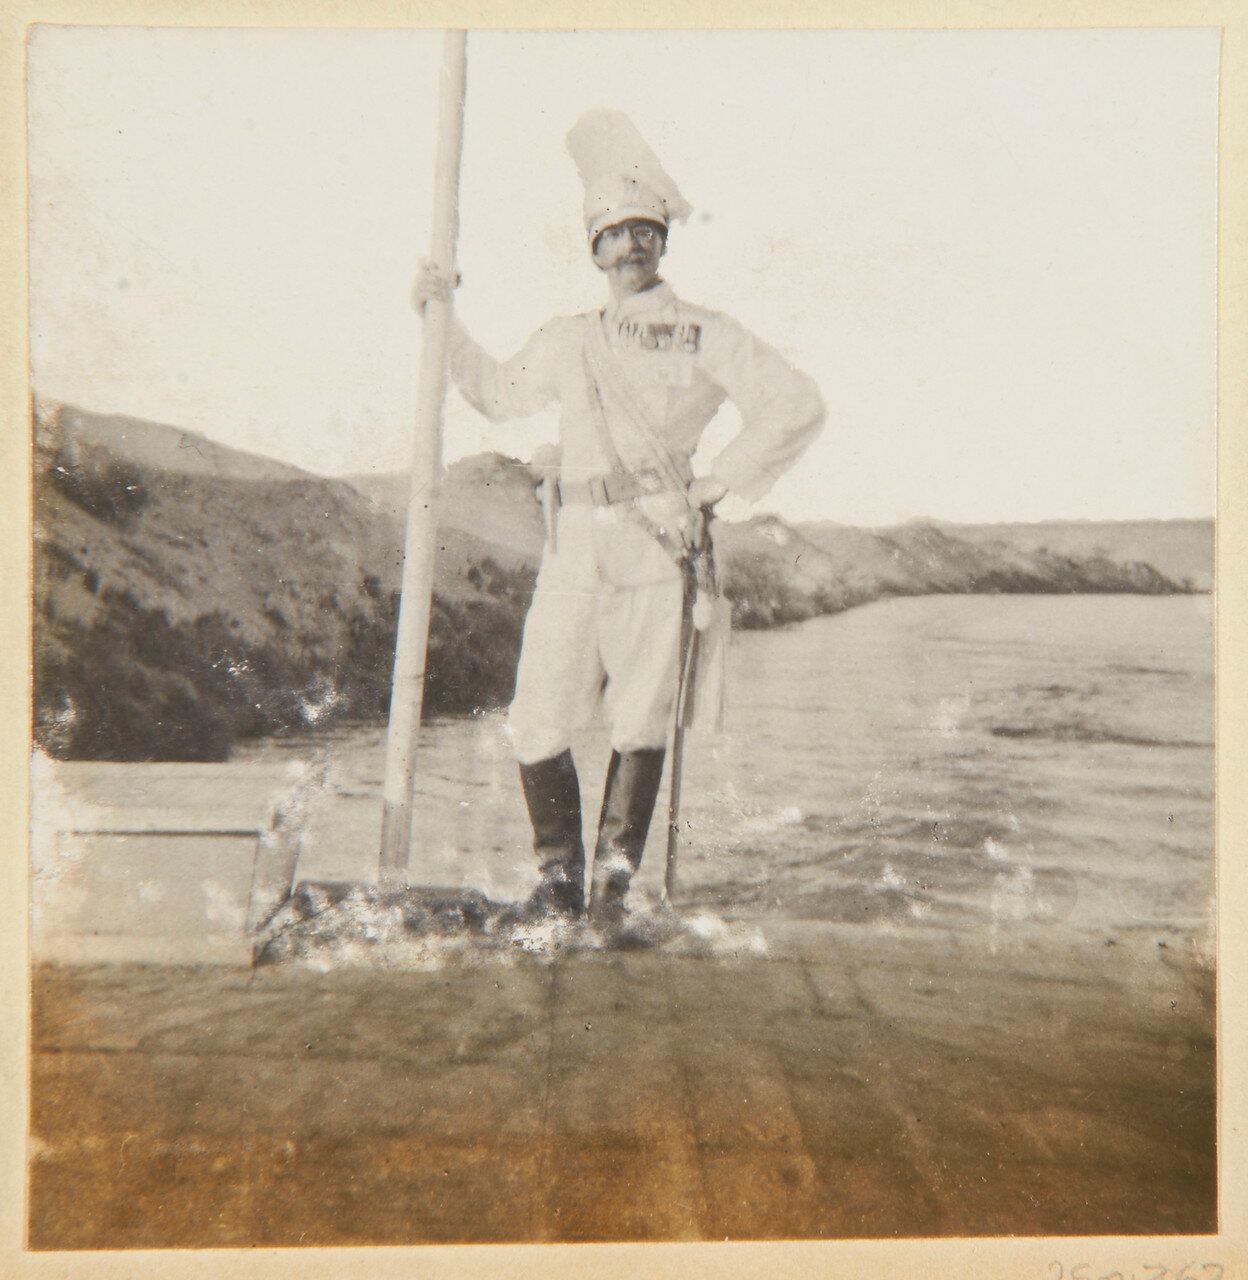 Август 1898. Капитан фон Тидеман (1865-1915), немецкий военный атташе